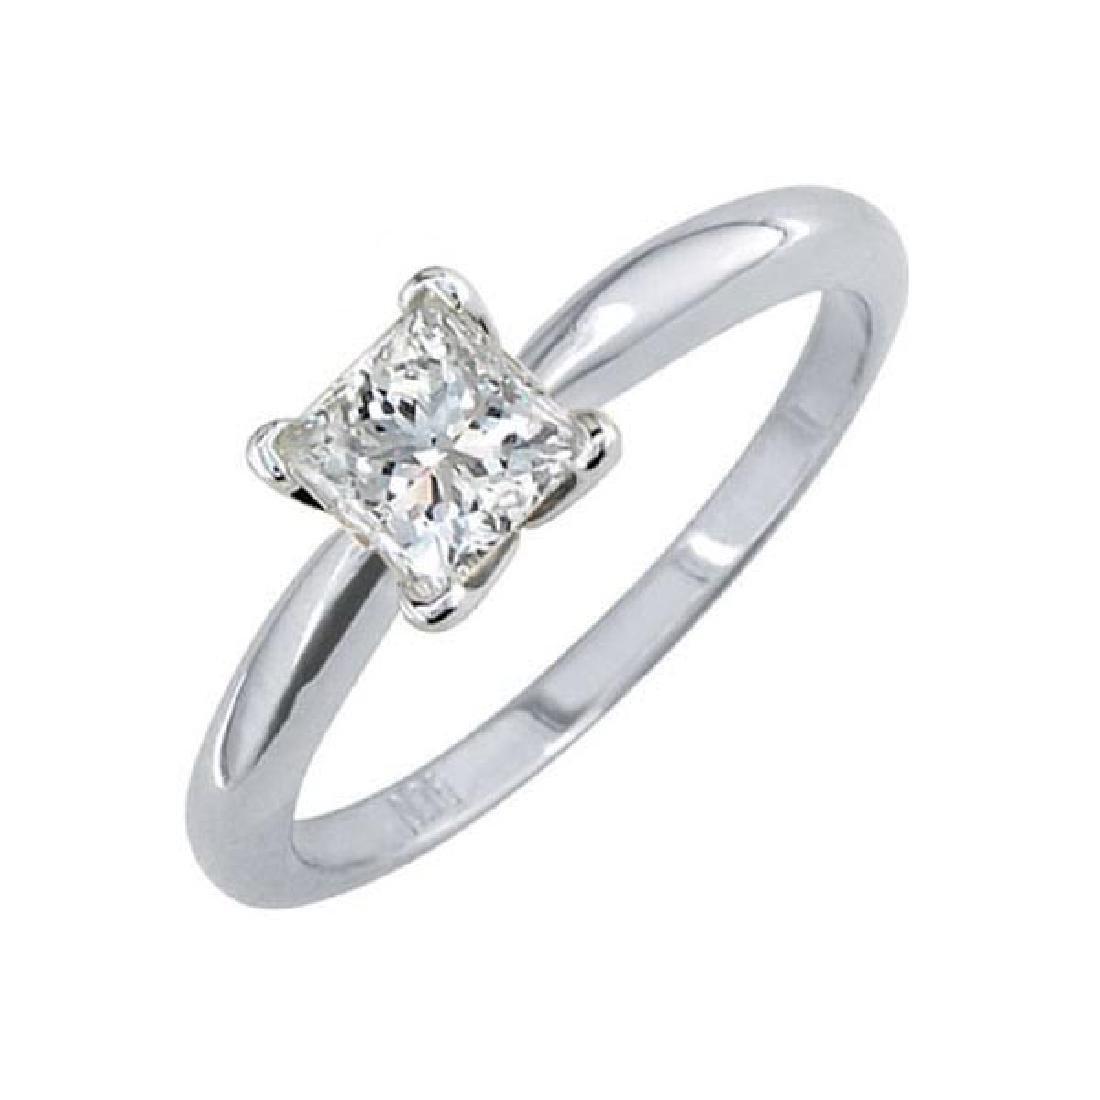 Certified 1.03 CTW Princess Diamond Solitaire 14k Ring